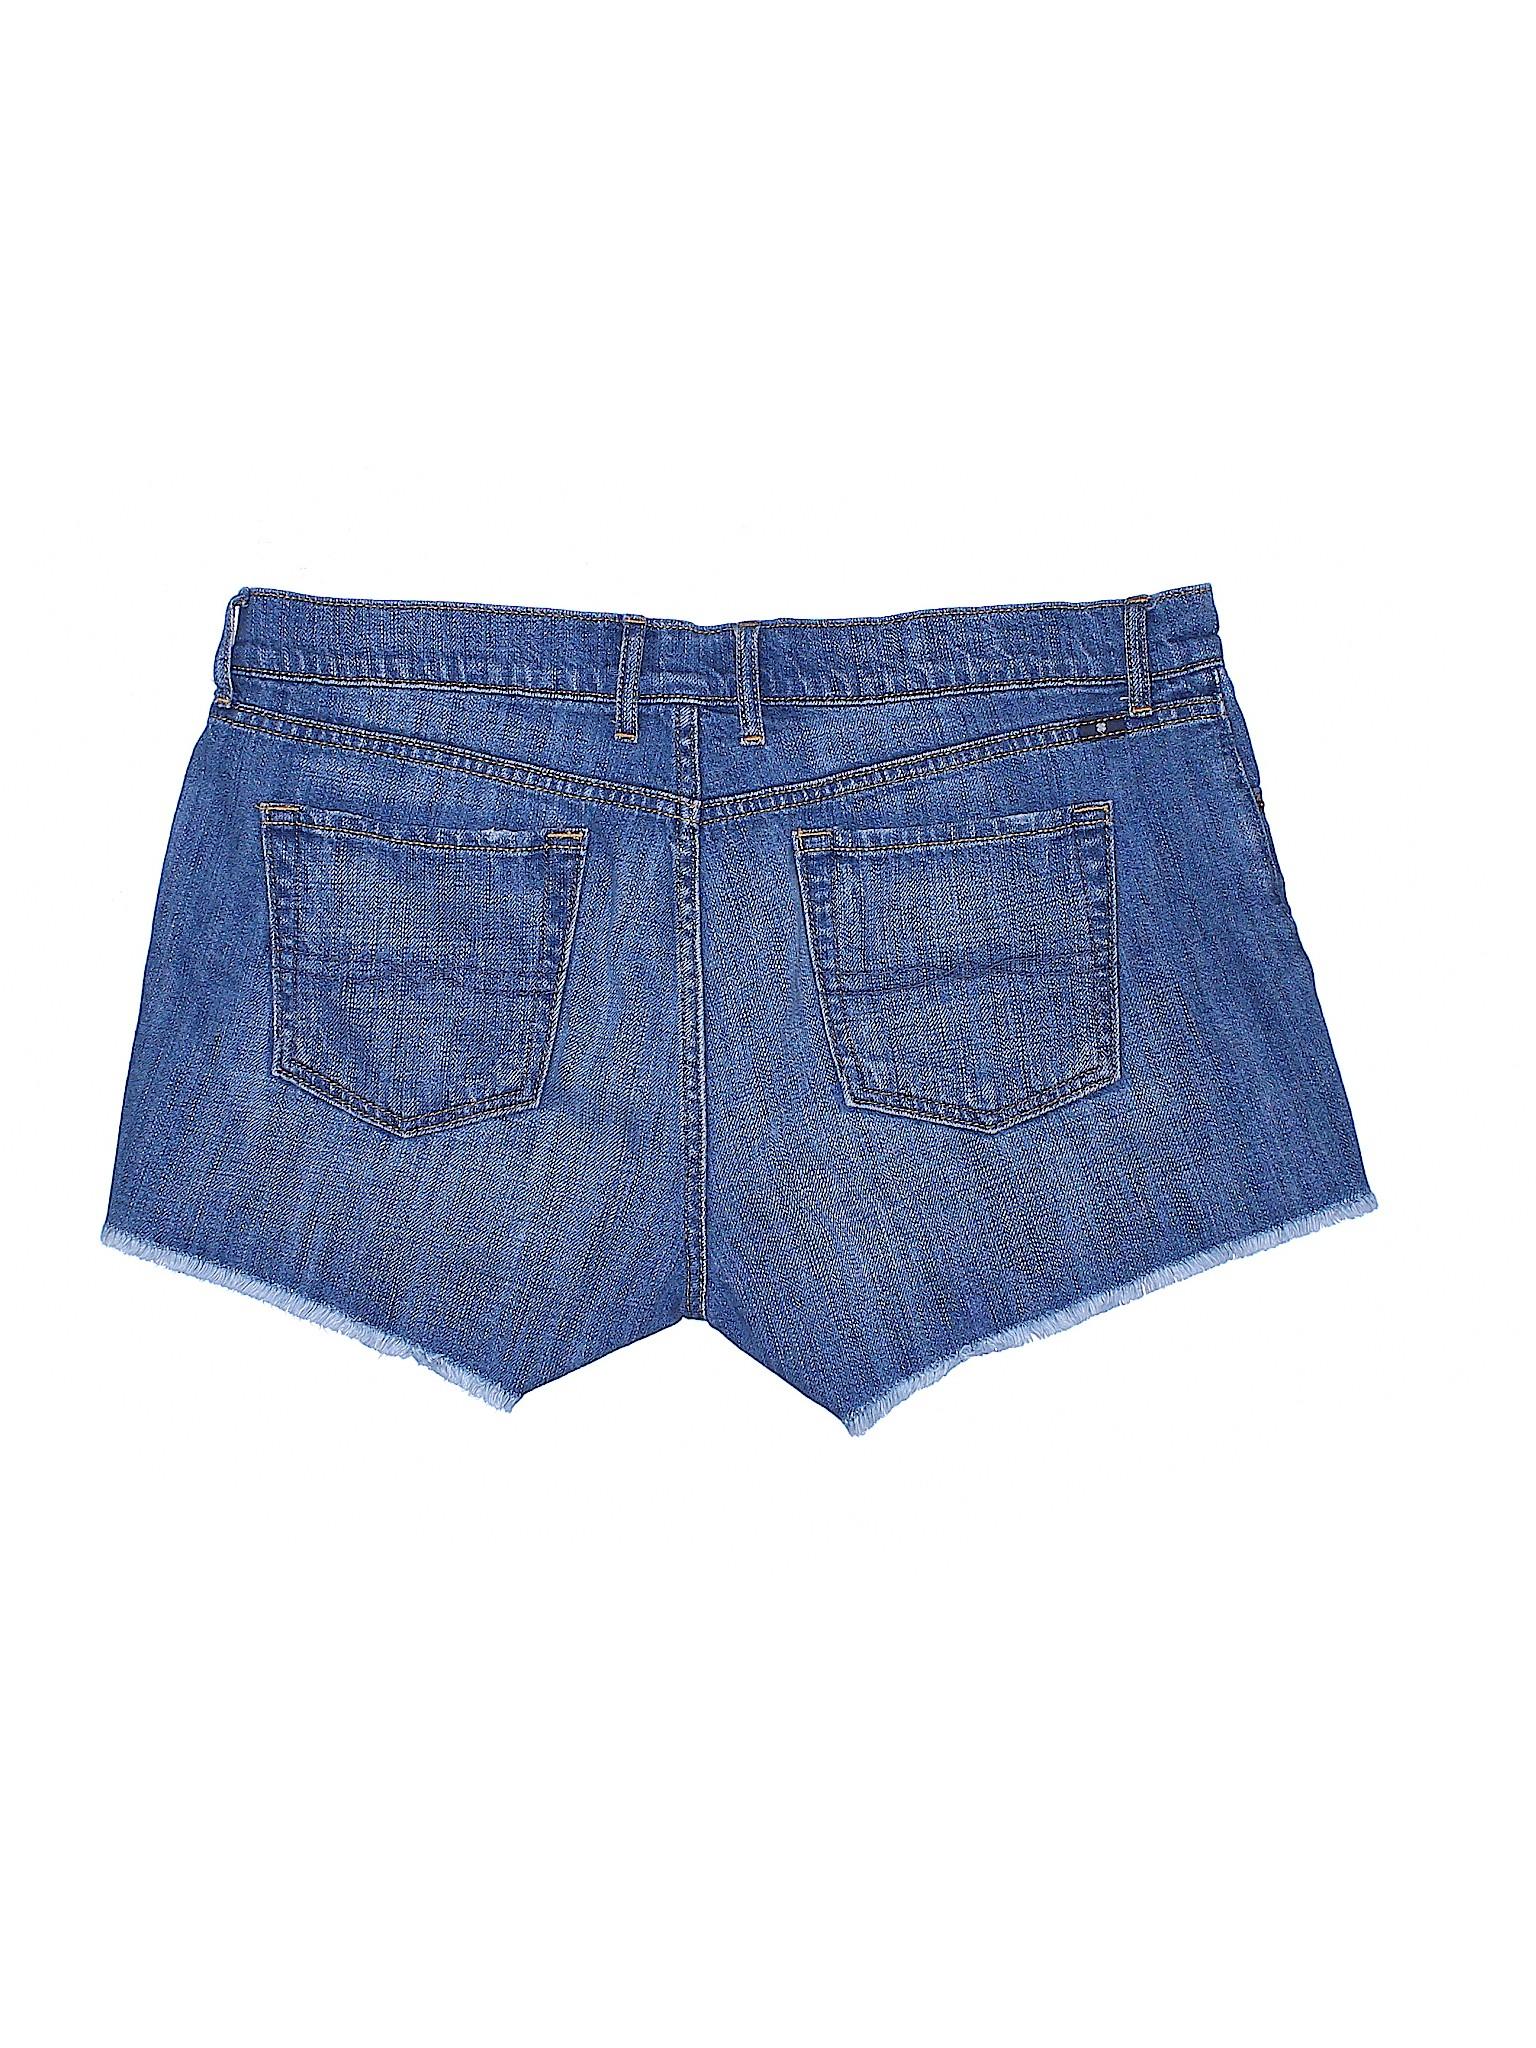 Shorts Brand Lucky winter Denim Leisure Uqp0wInx